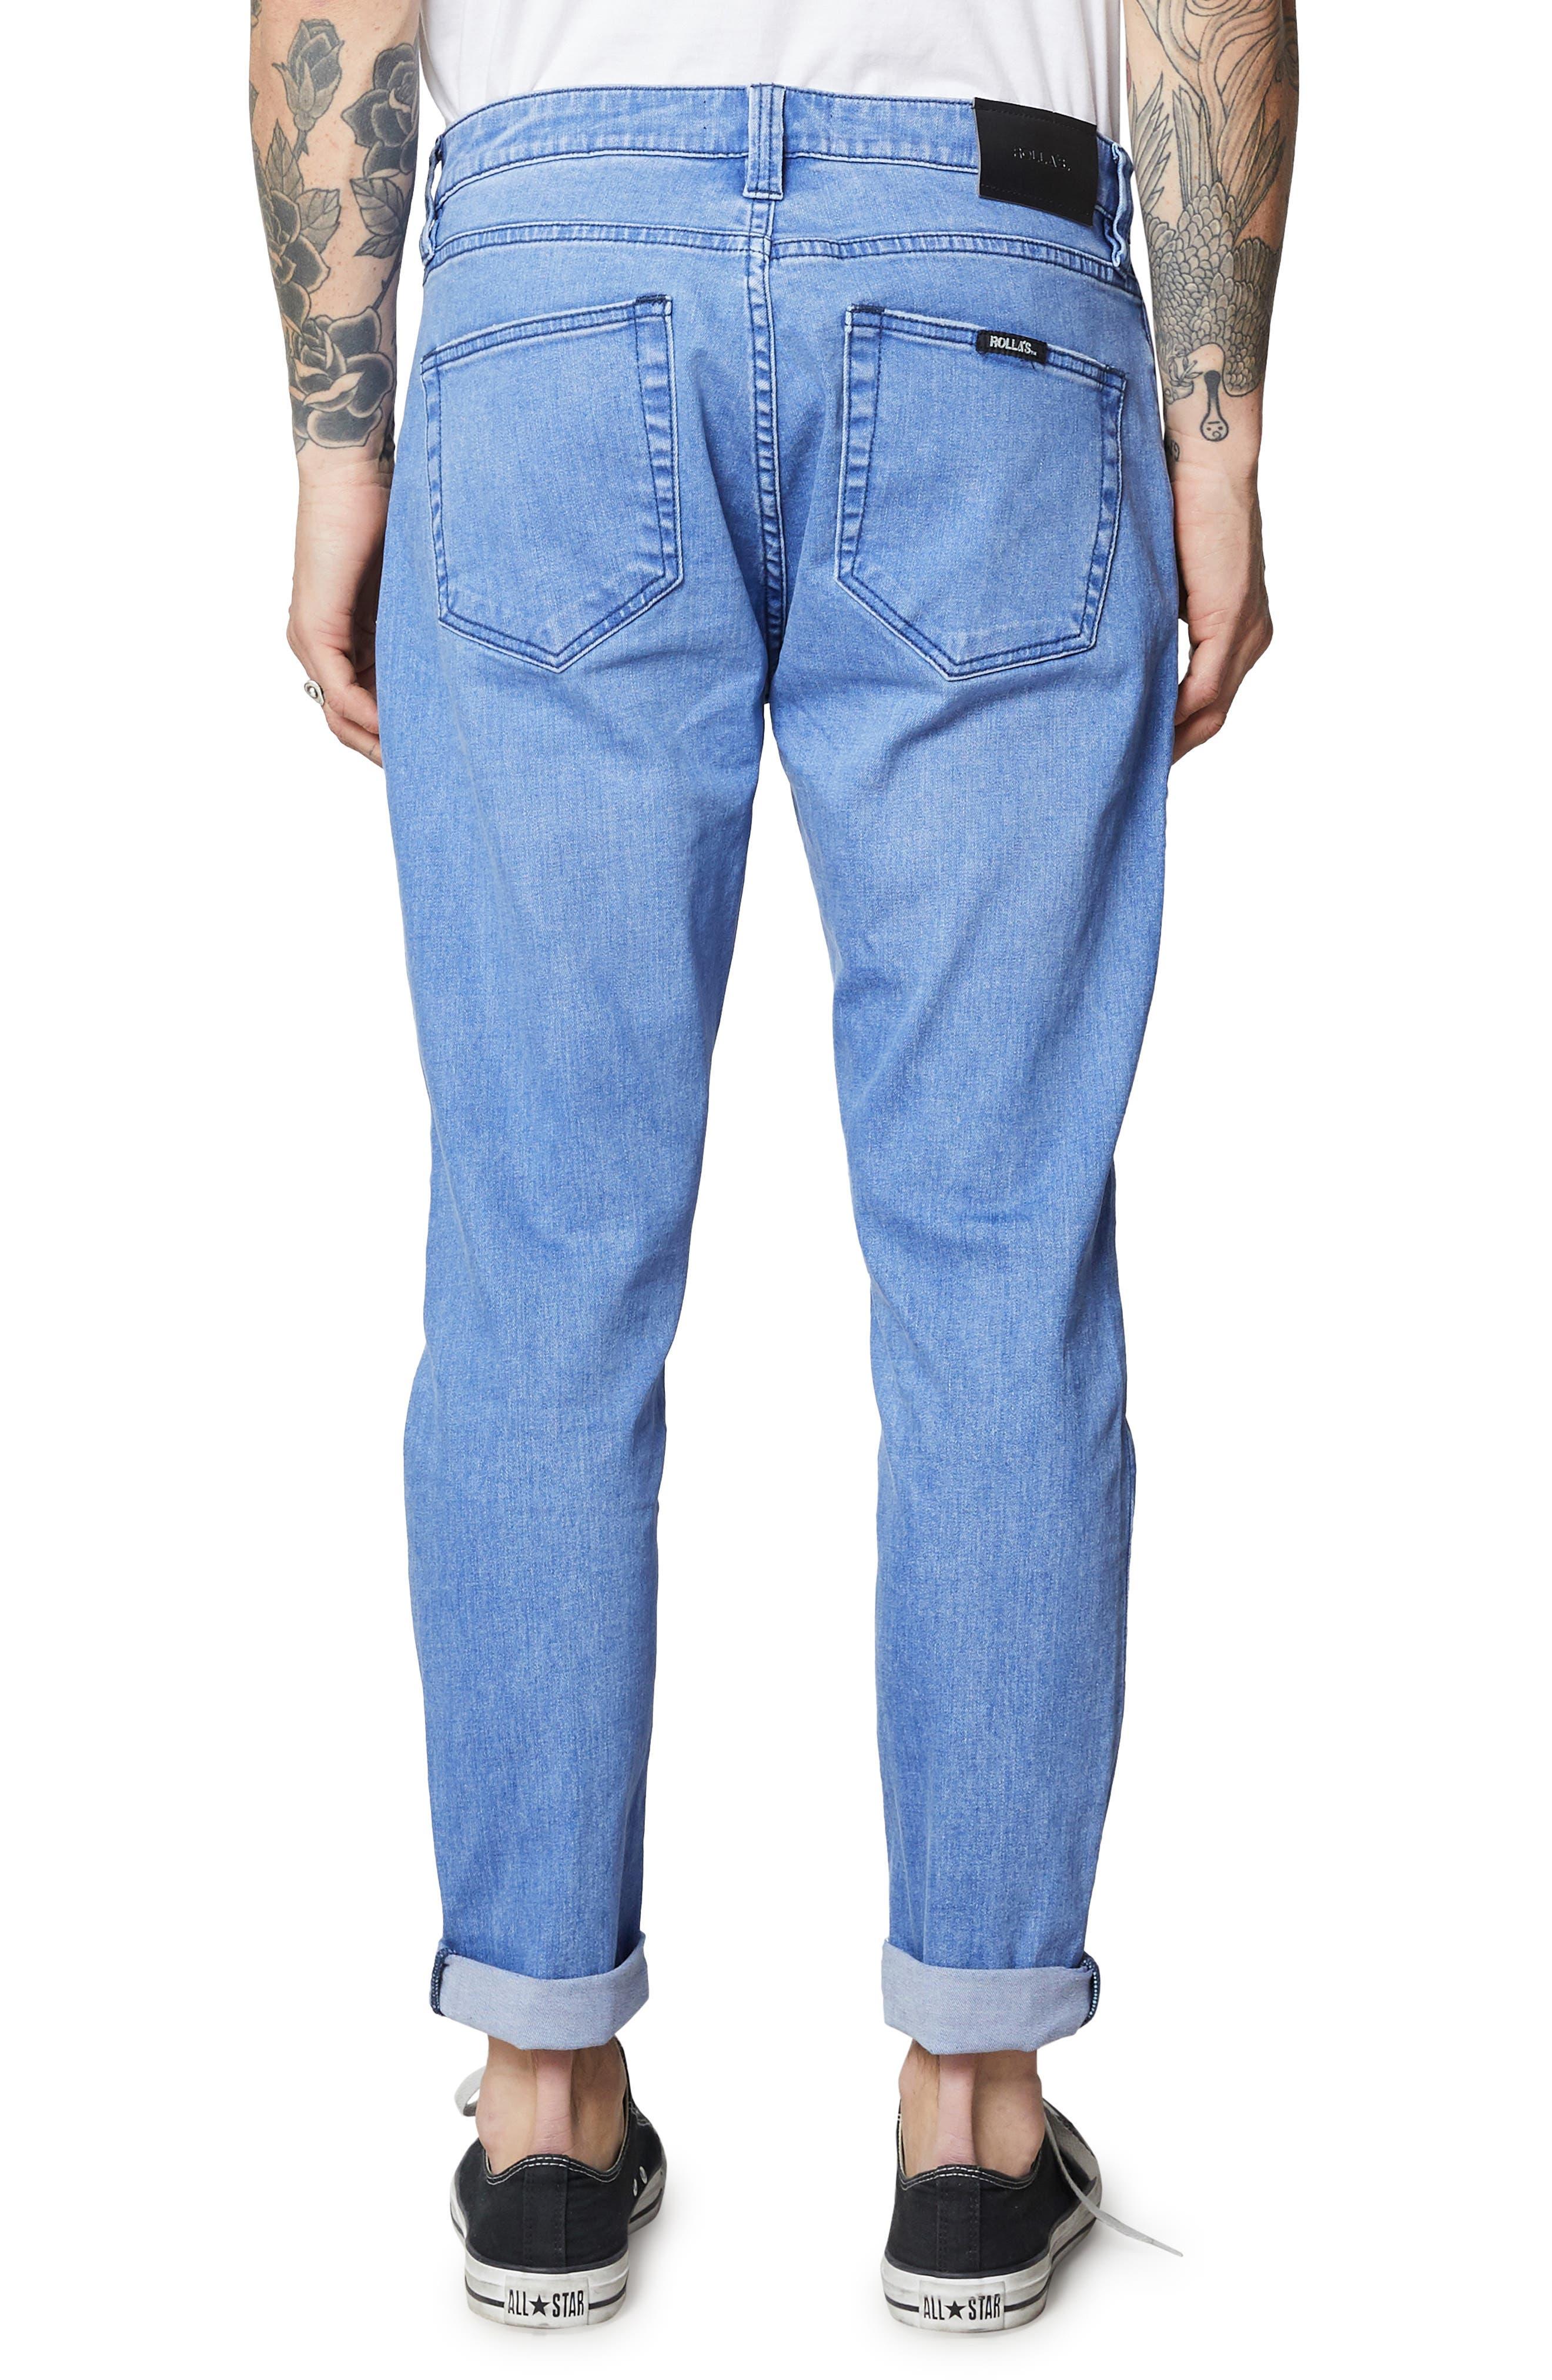 Rollies Slim Fit Jeans,                             Alternate thumbnail 2, color,                             BOLD BLUE